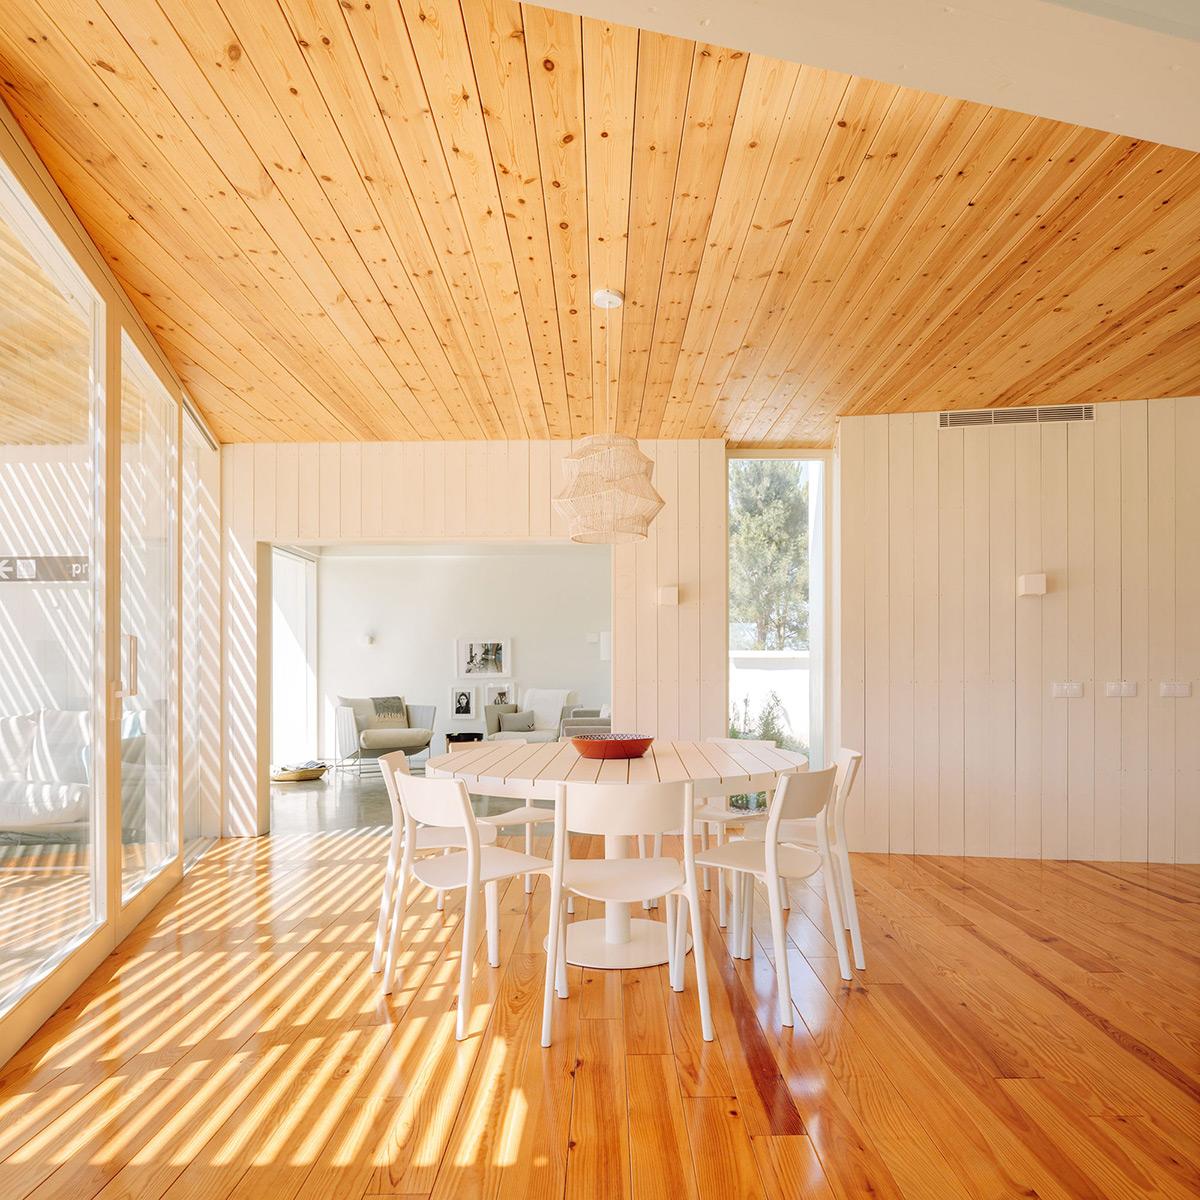 Casa-Comporta-Almeida-Fernandes-Arquitectura-Francisco-Nogueira-06